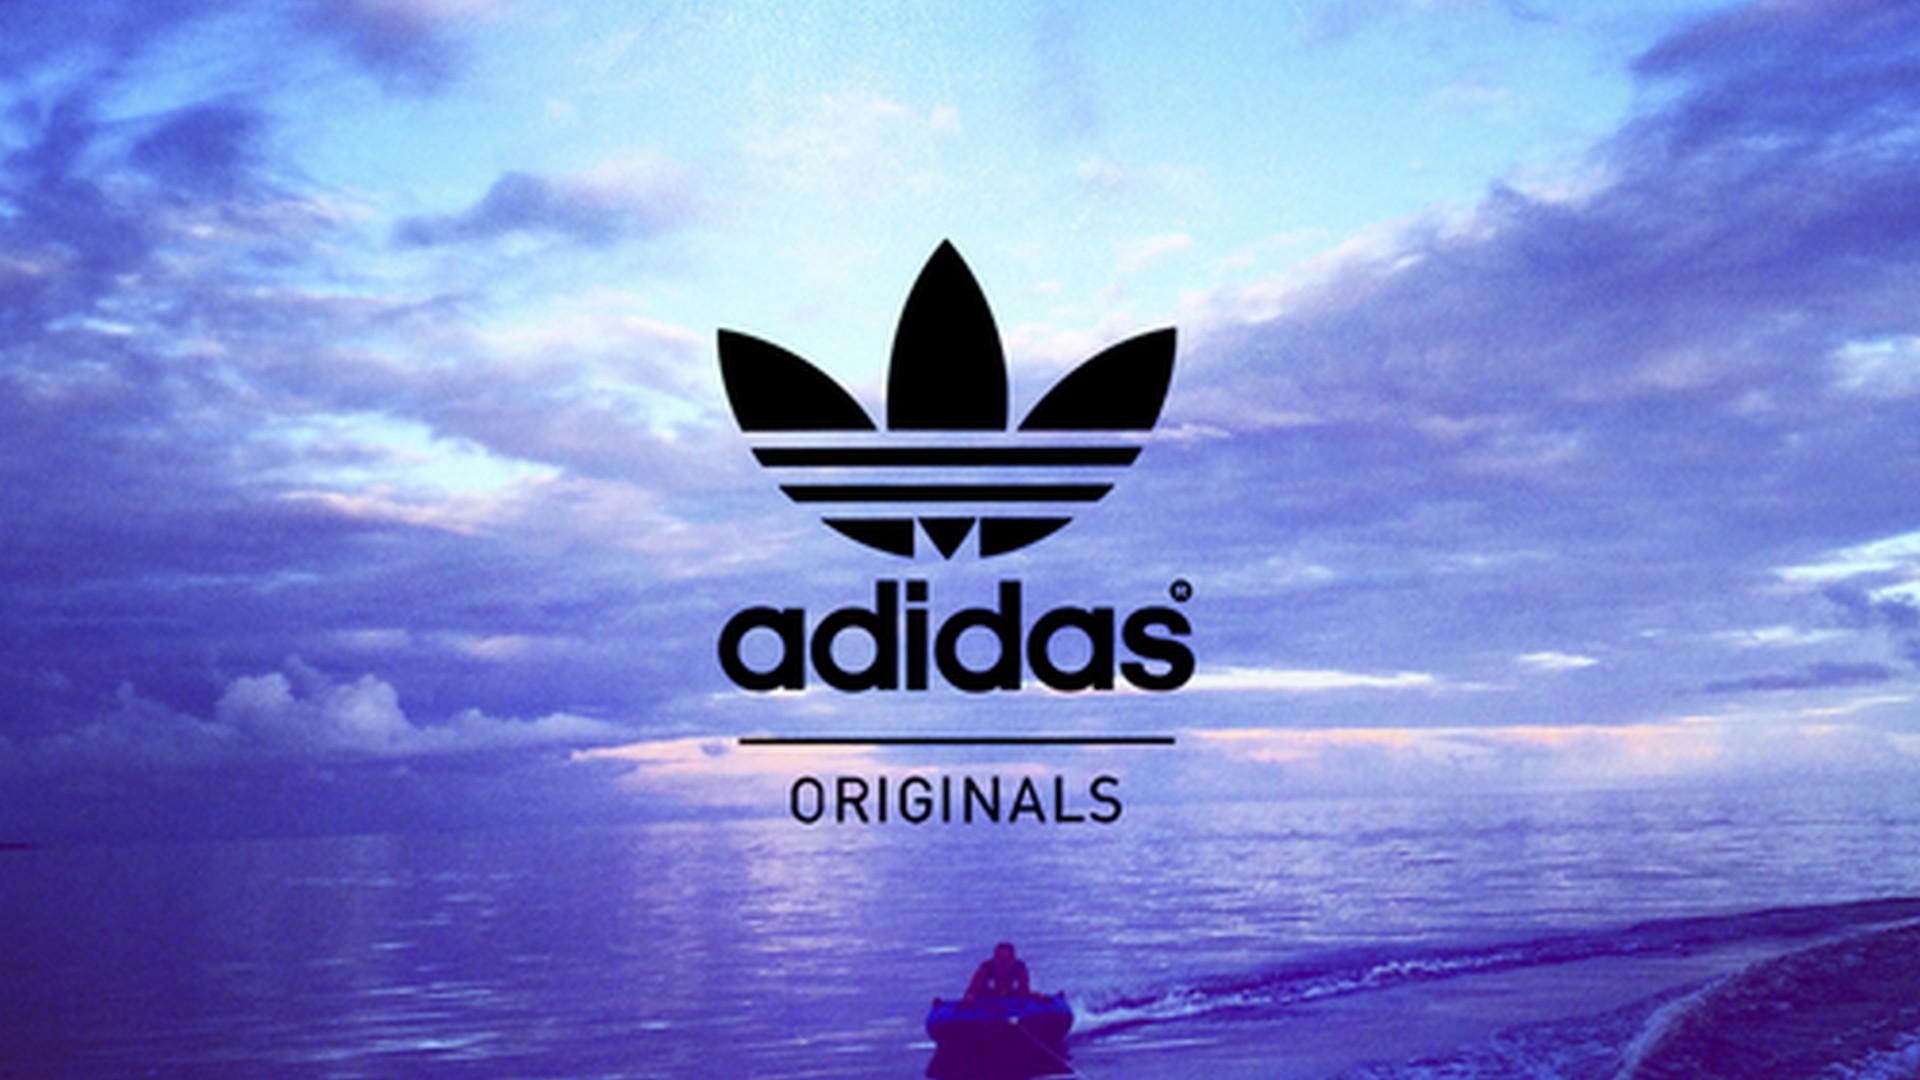 wallpaper adidas 70696